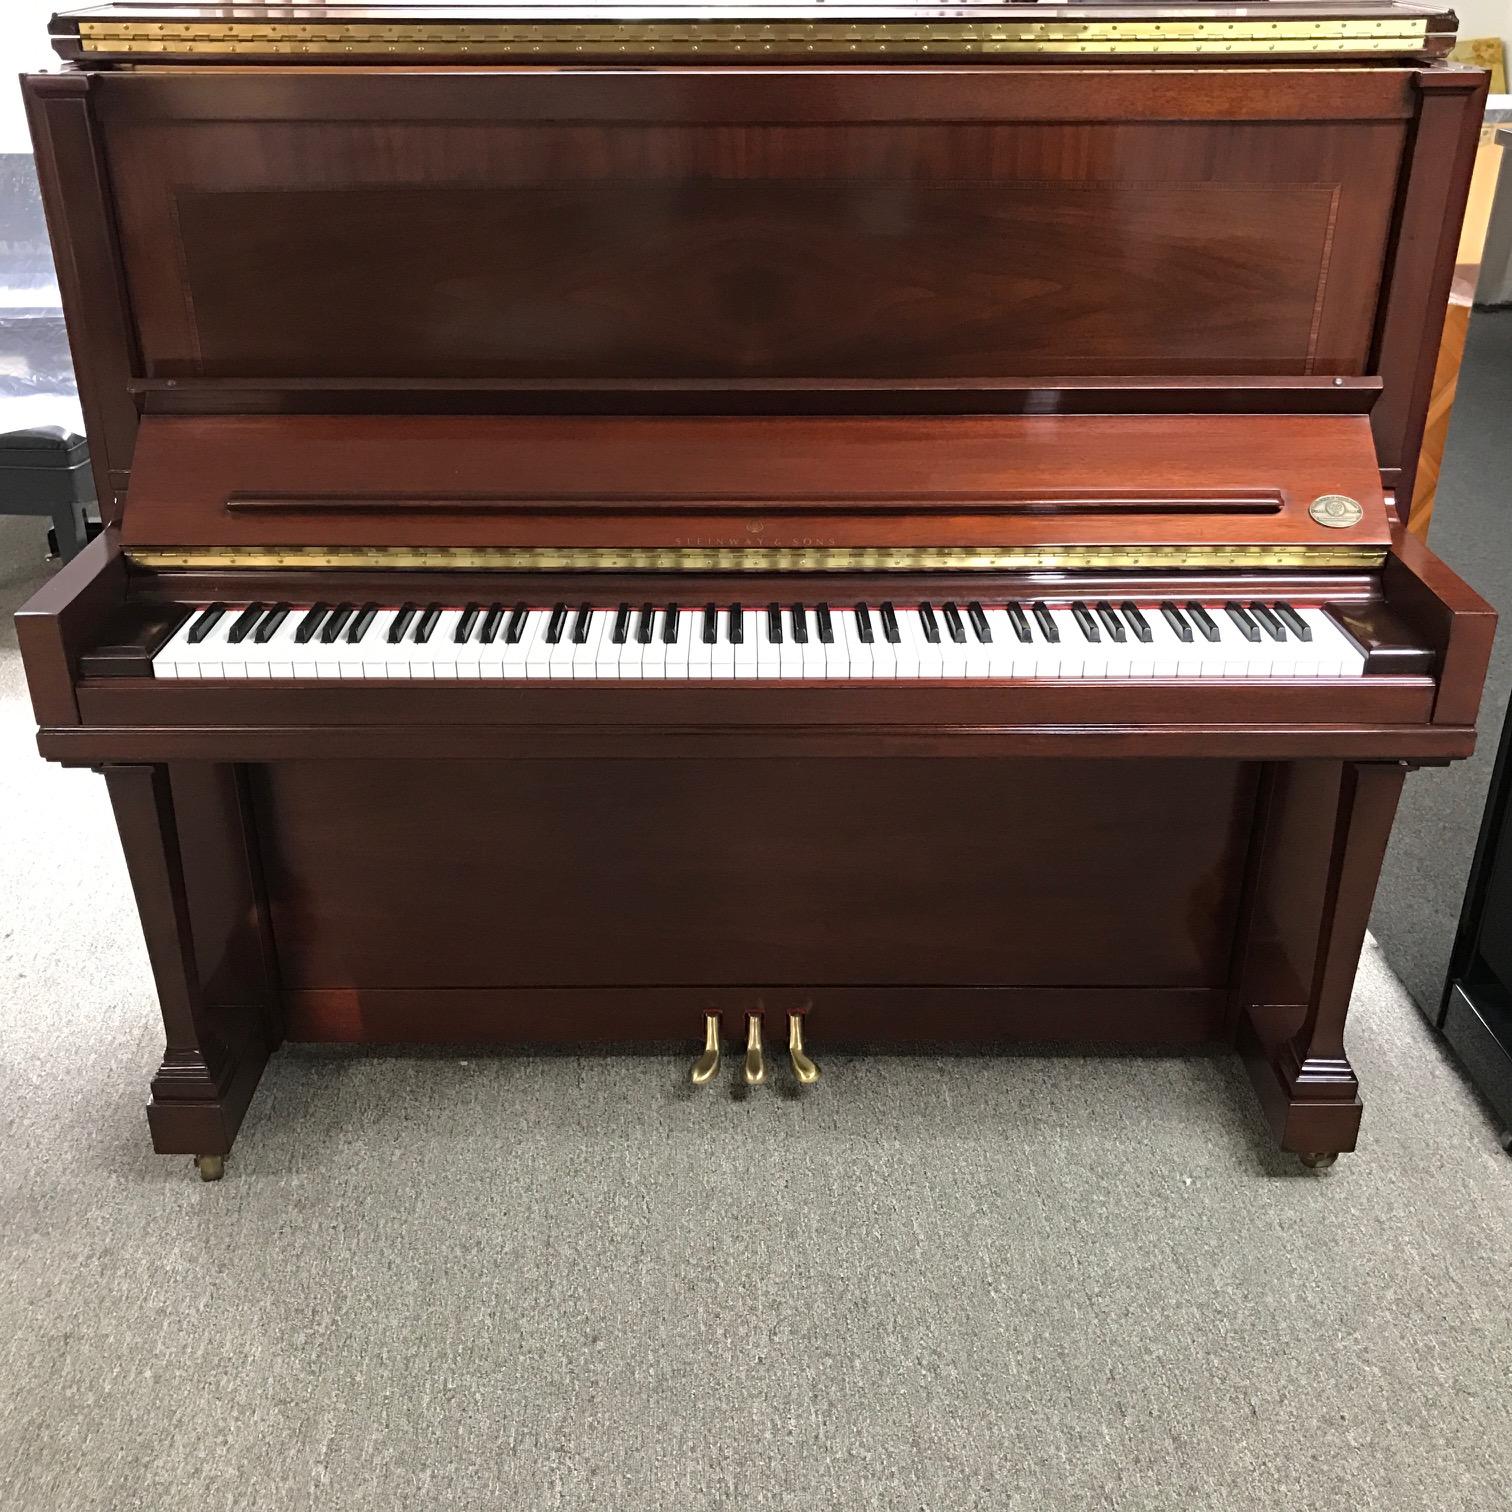 2003 Crown Jewel Steinway Quot K 52 Quot Mahogany Upright Piano